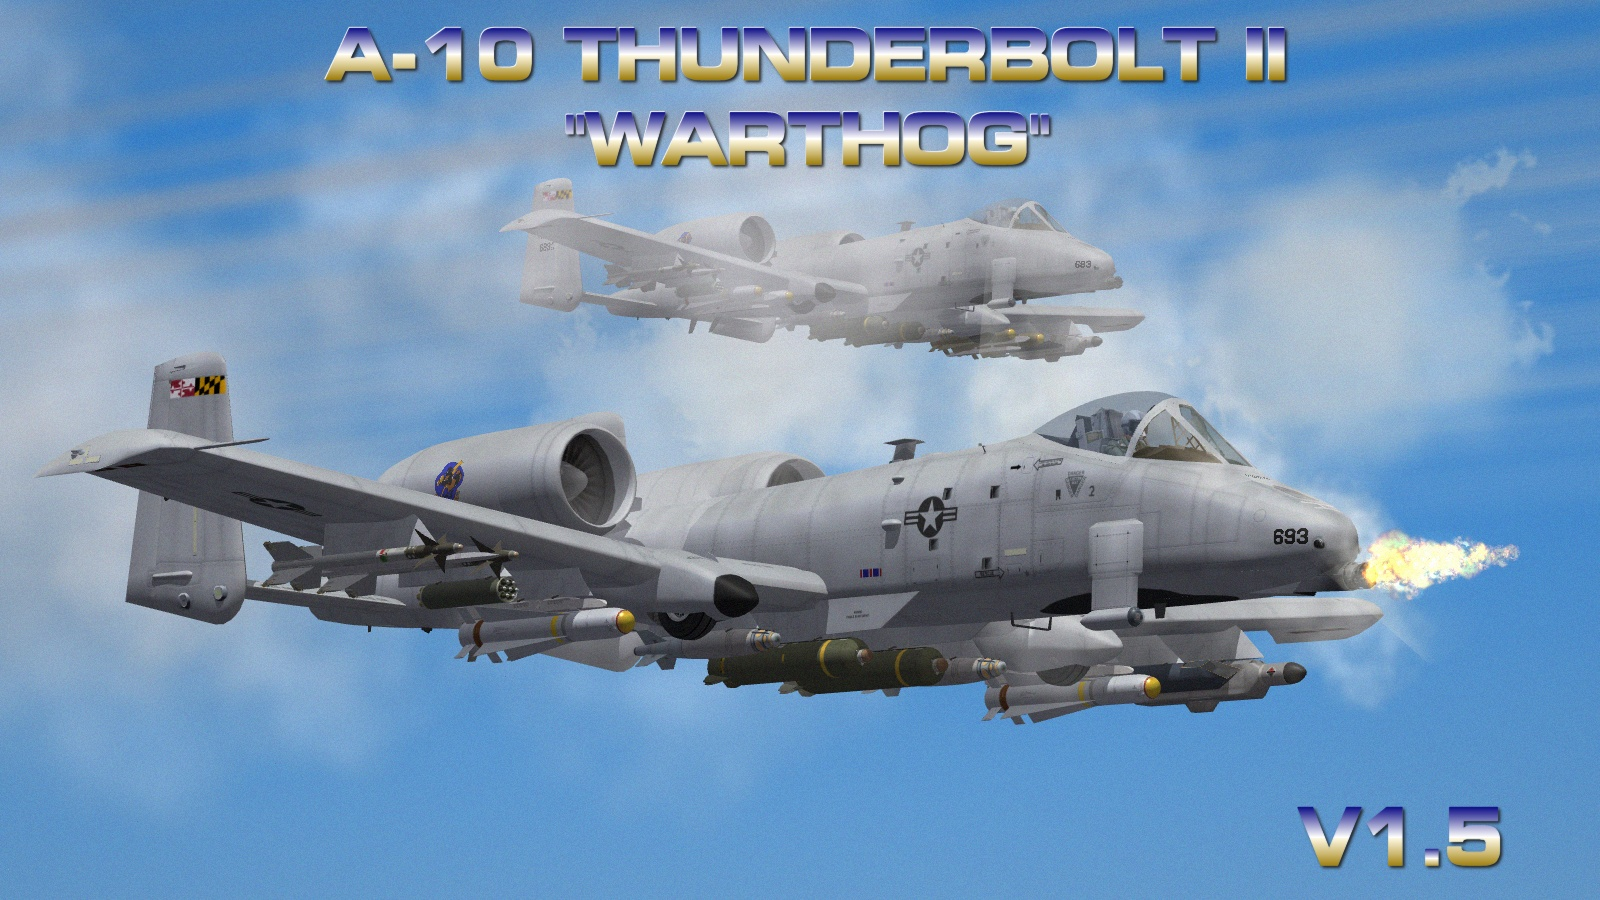 A-10A and C Thunderbolt II